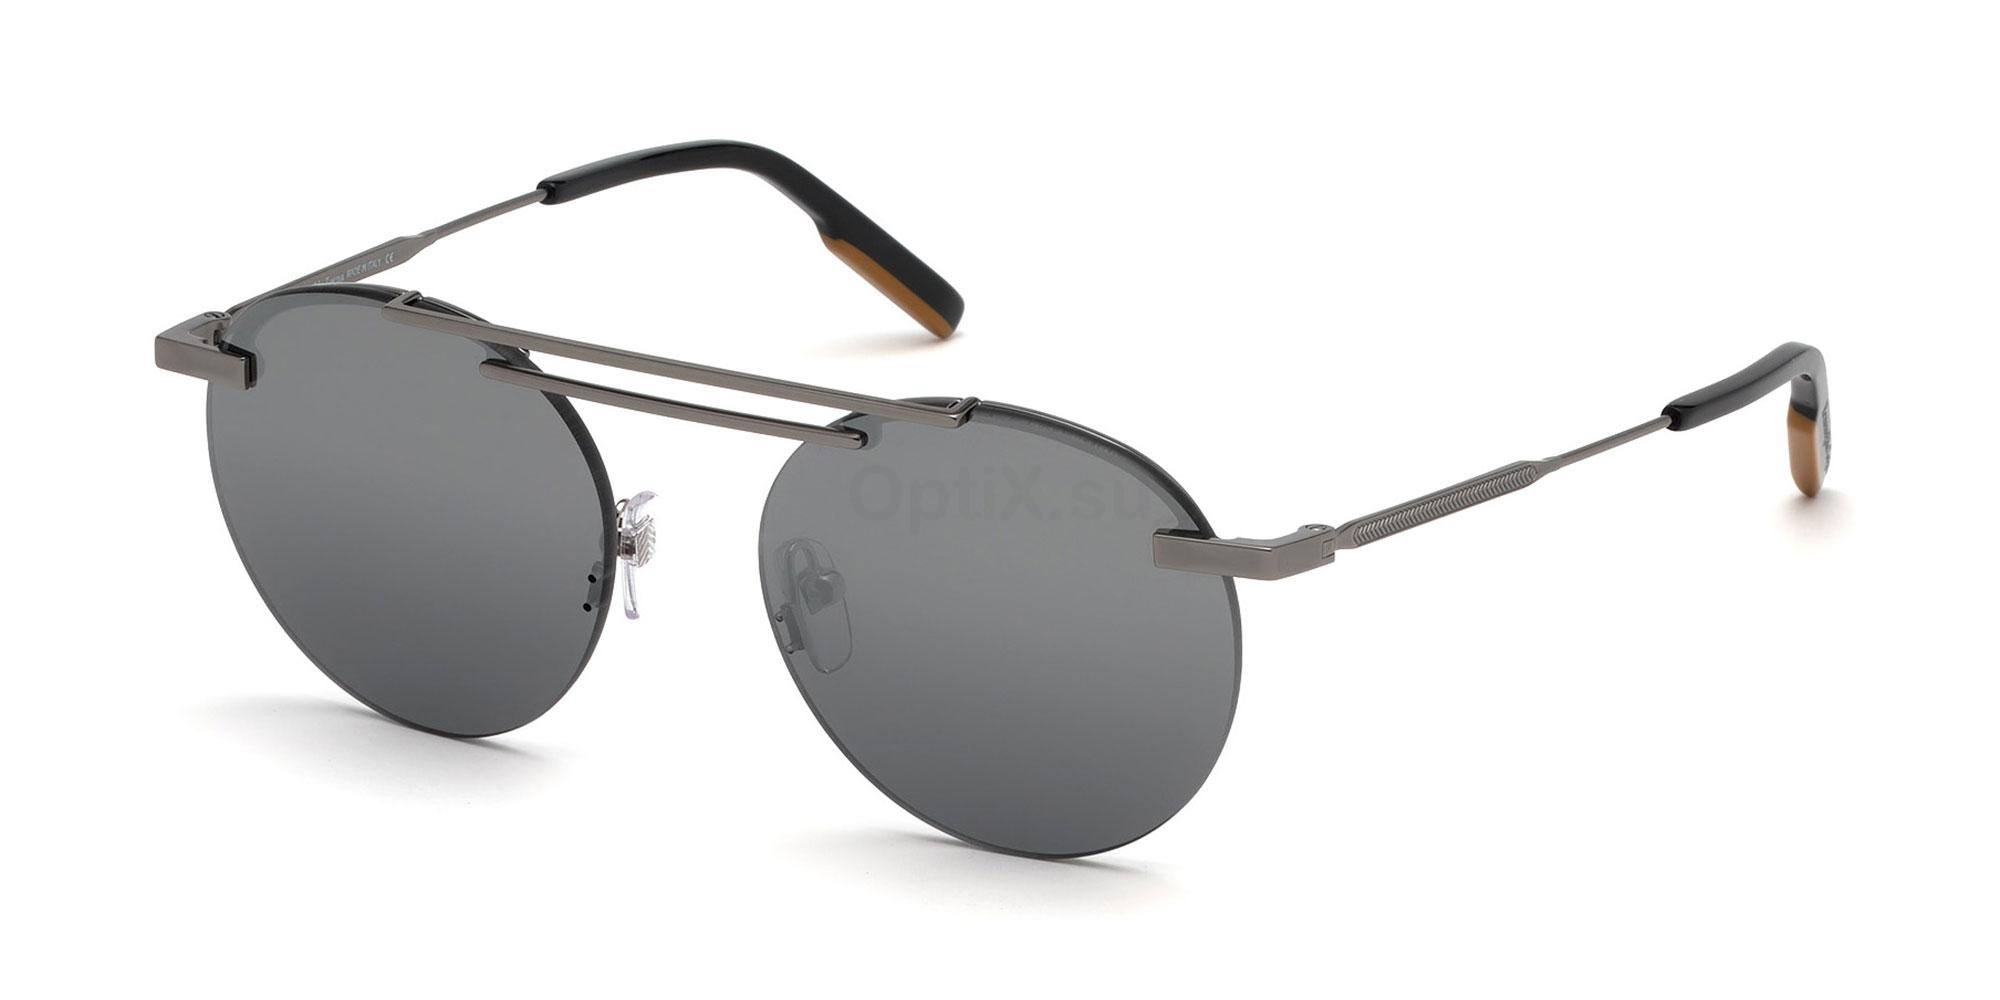 08C EZ0116 Sunglasses, Ermenegildo Zegna